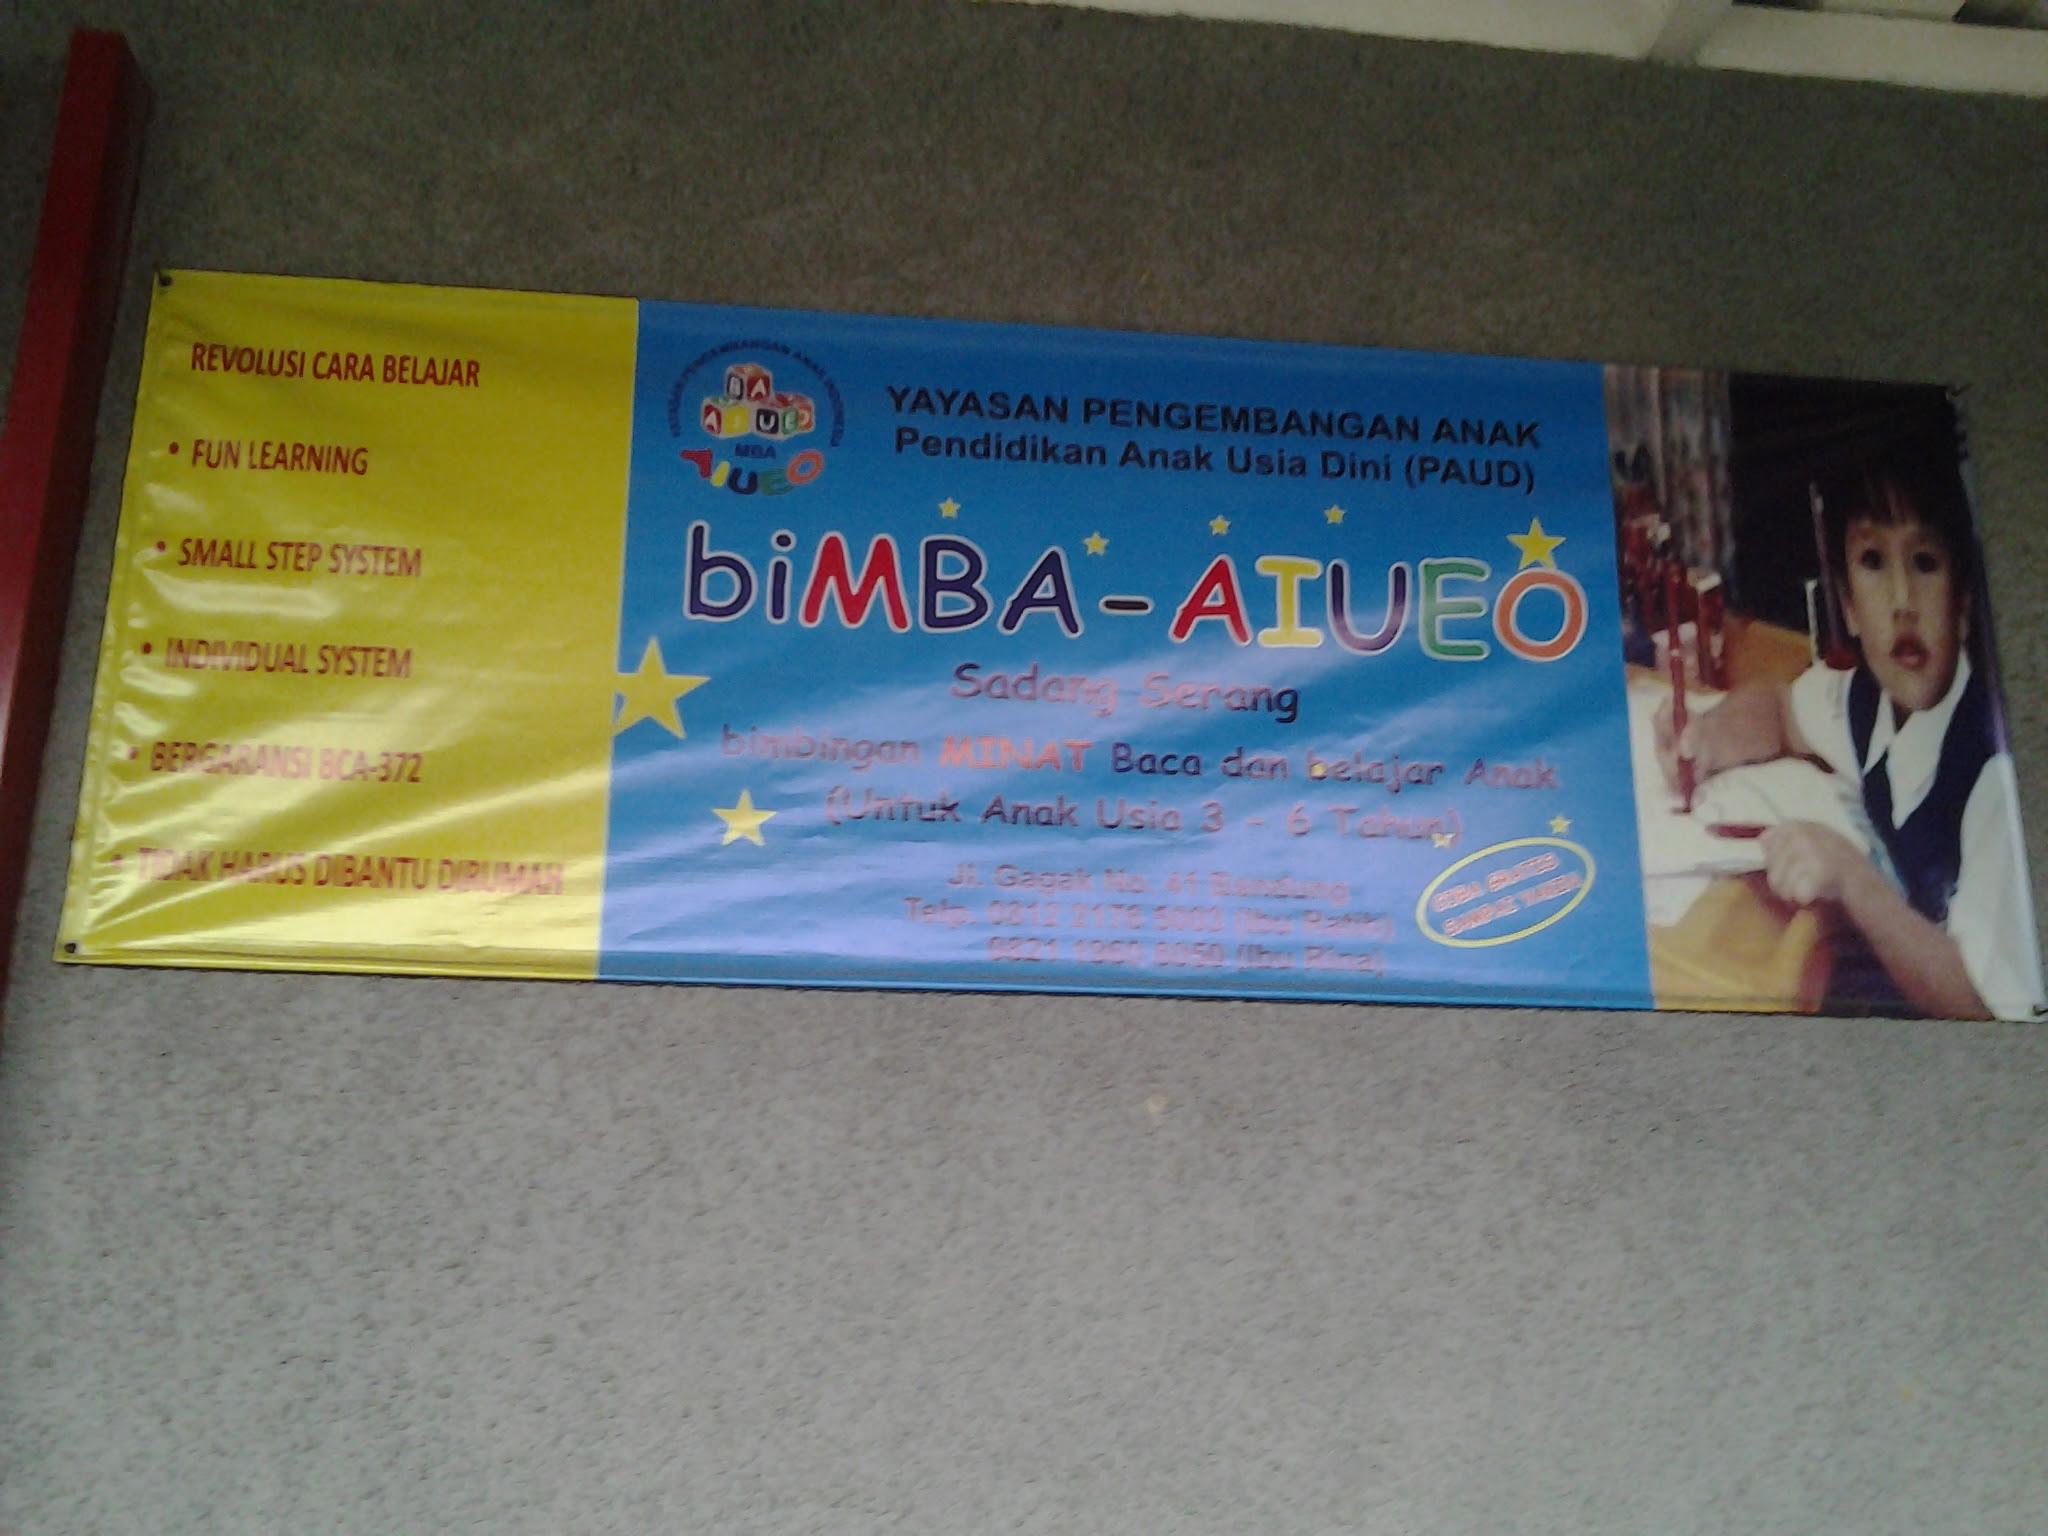 Yayasan Pengembangan Anak Indonesia